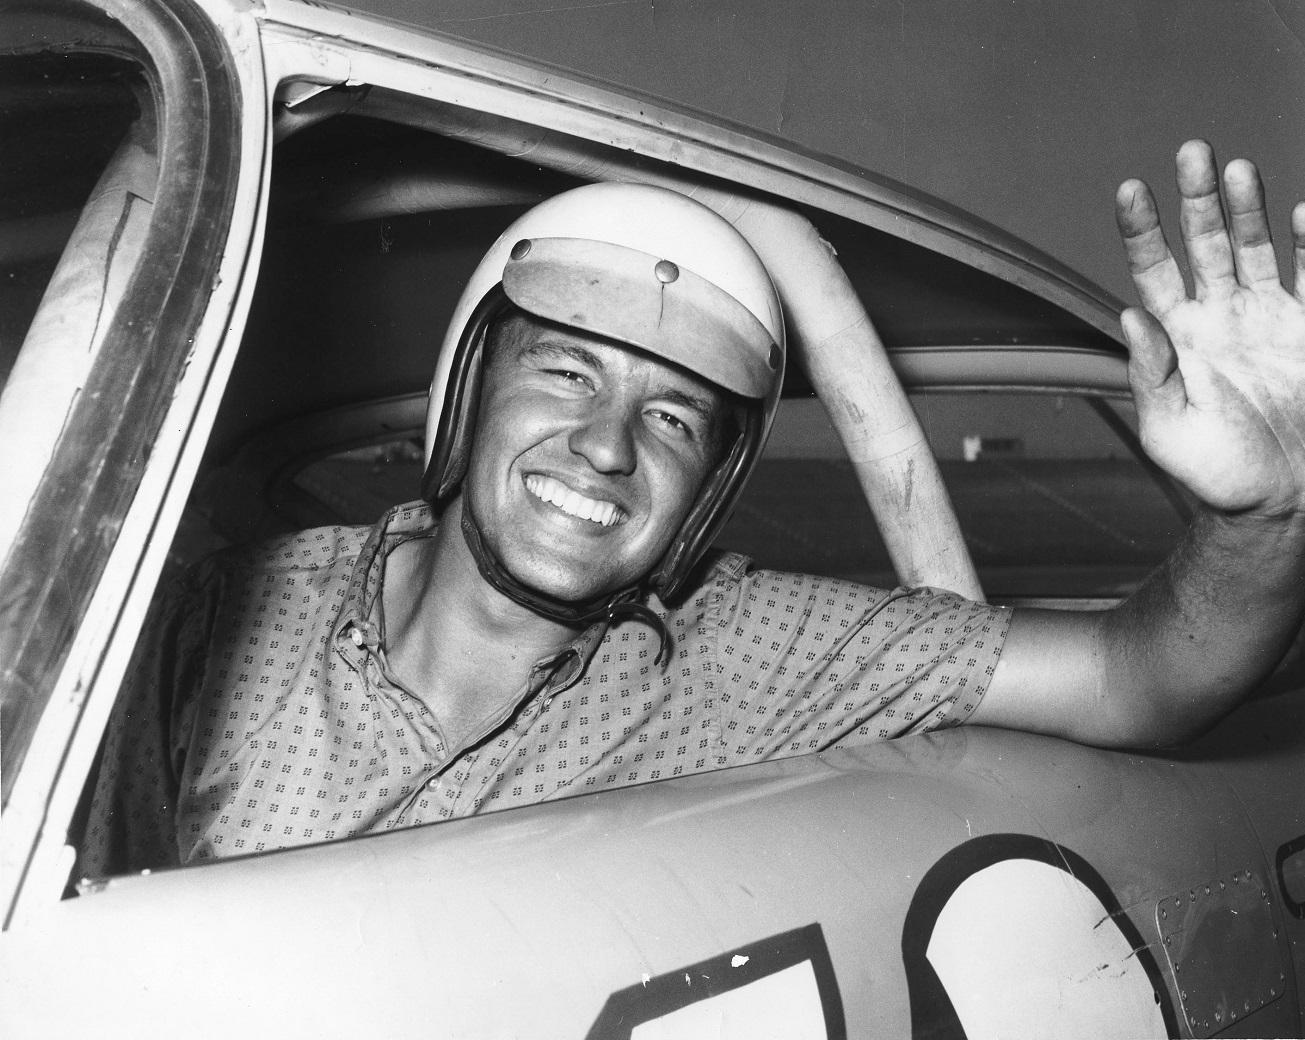 Seven-time NASCAR Cup Series champion Richard Petty